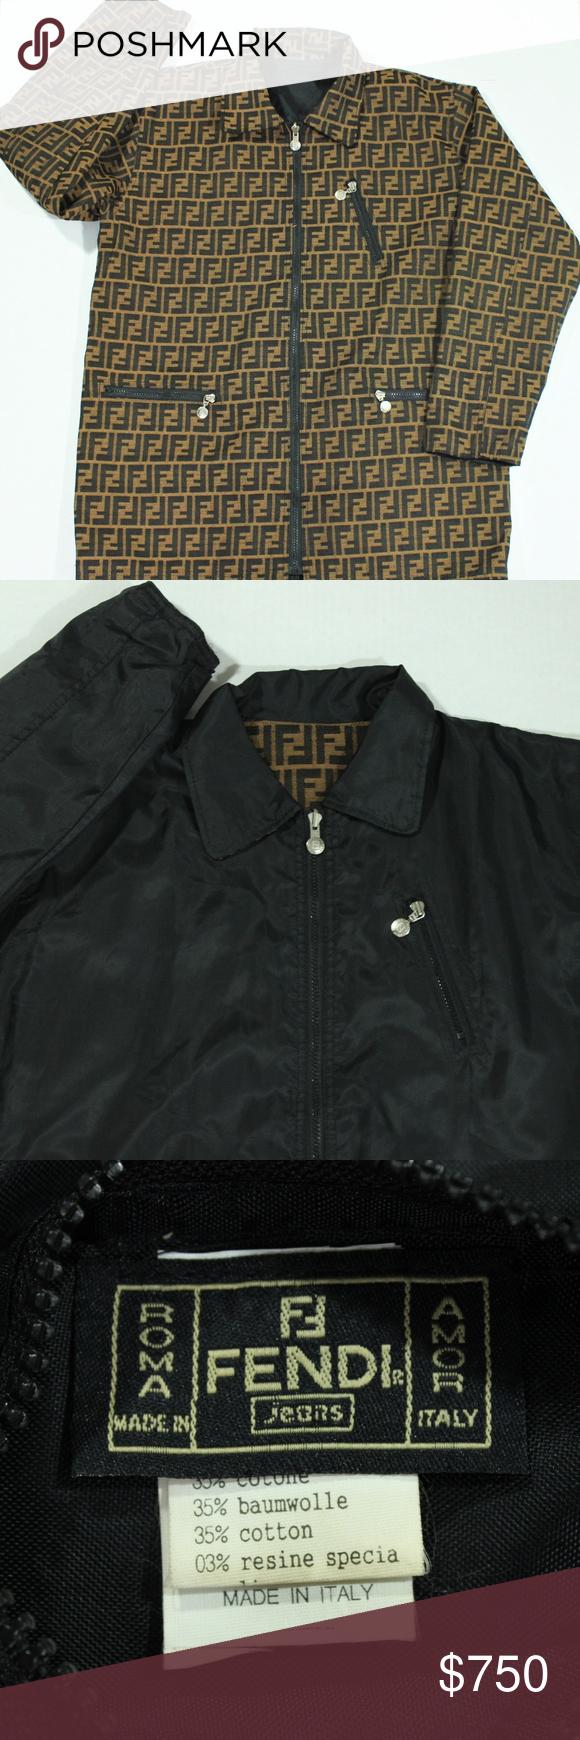 Vintage Fendi Zucca Monogram Reversible Jacket 10 Vintage Authentic Fendi Zucca Monogram Reversible Jacket Men Reversible Jackets Reversible Jacket Men Jackets